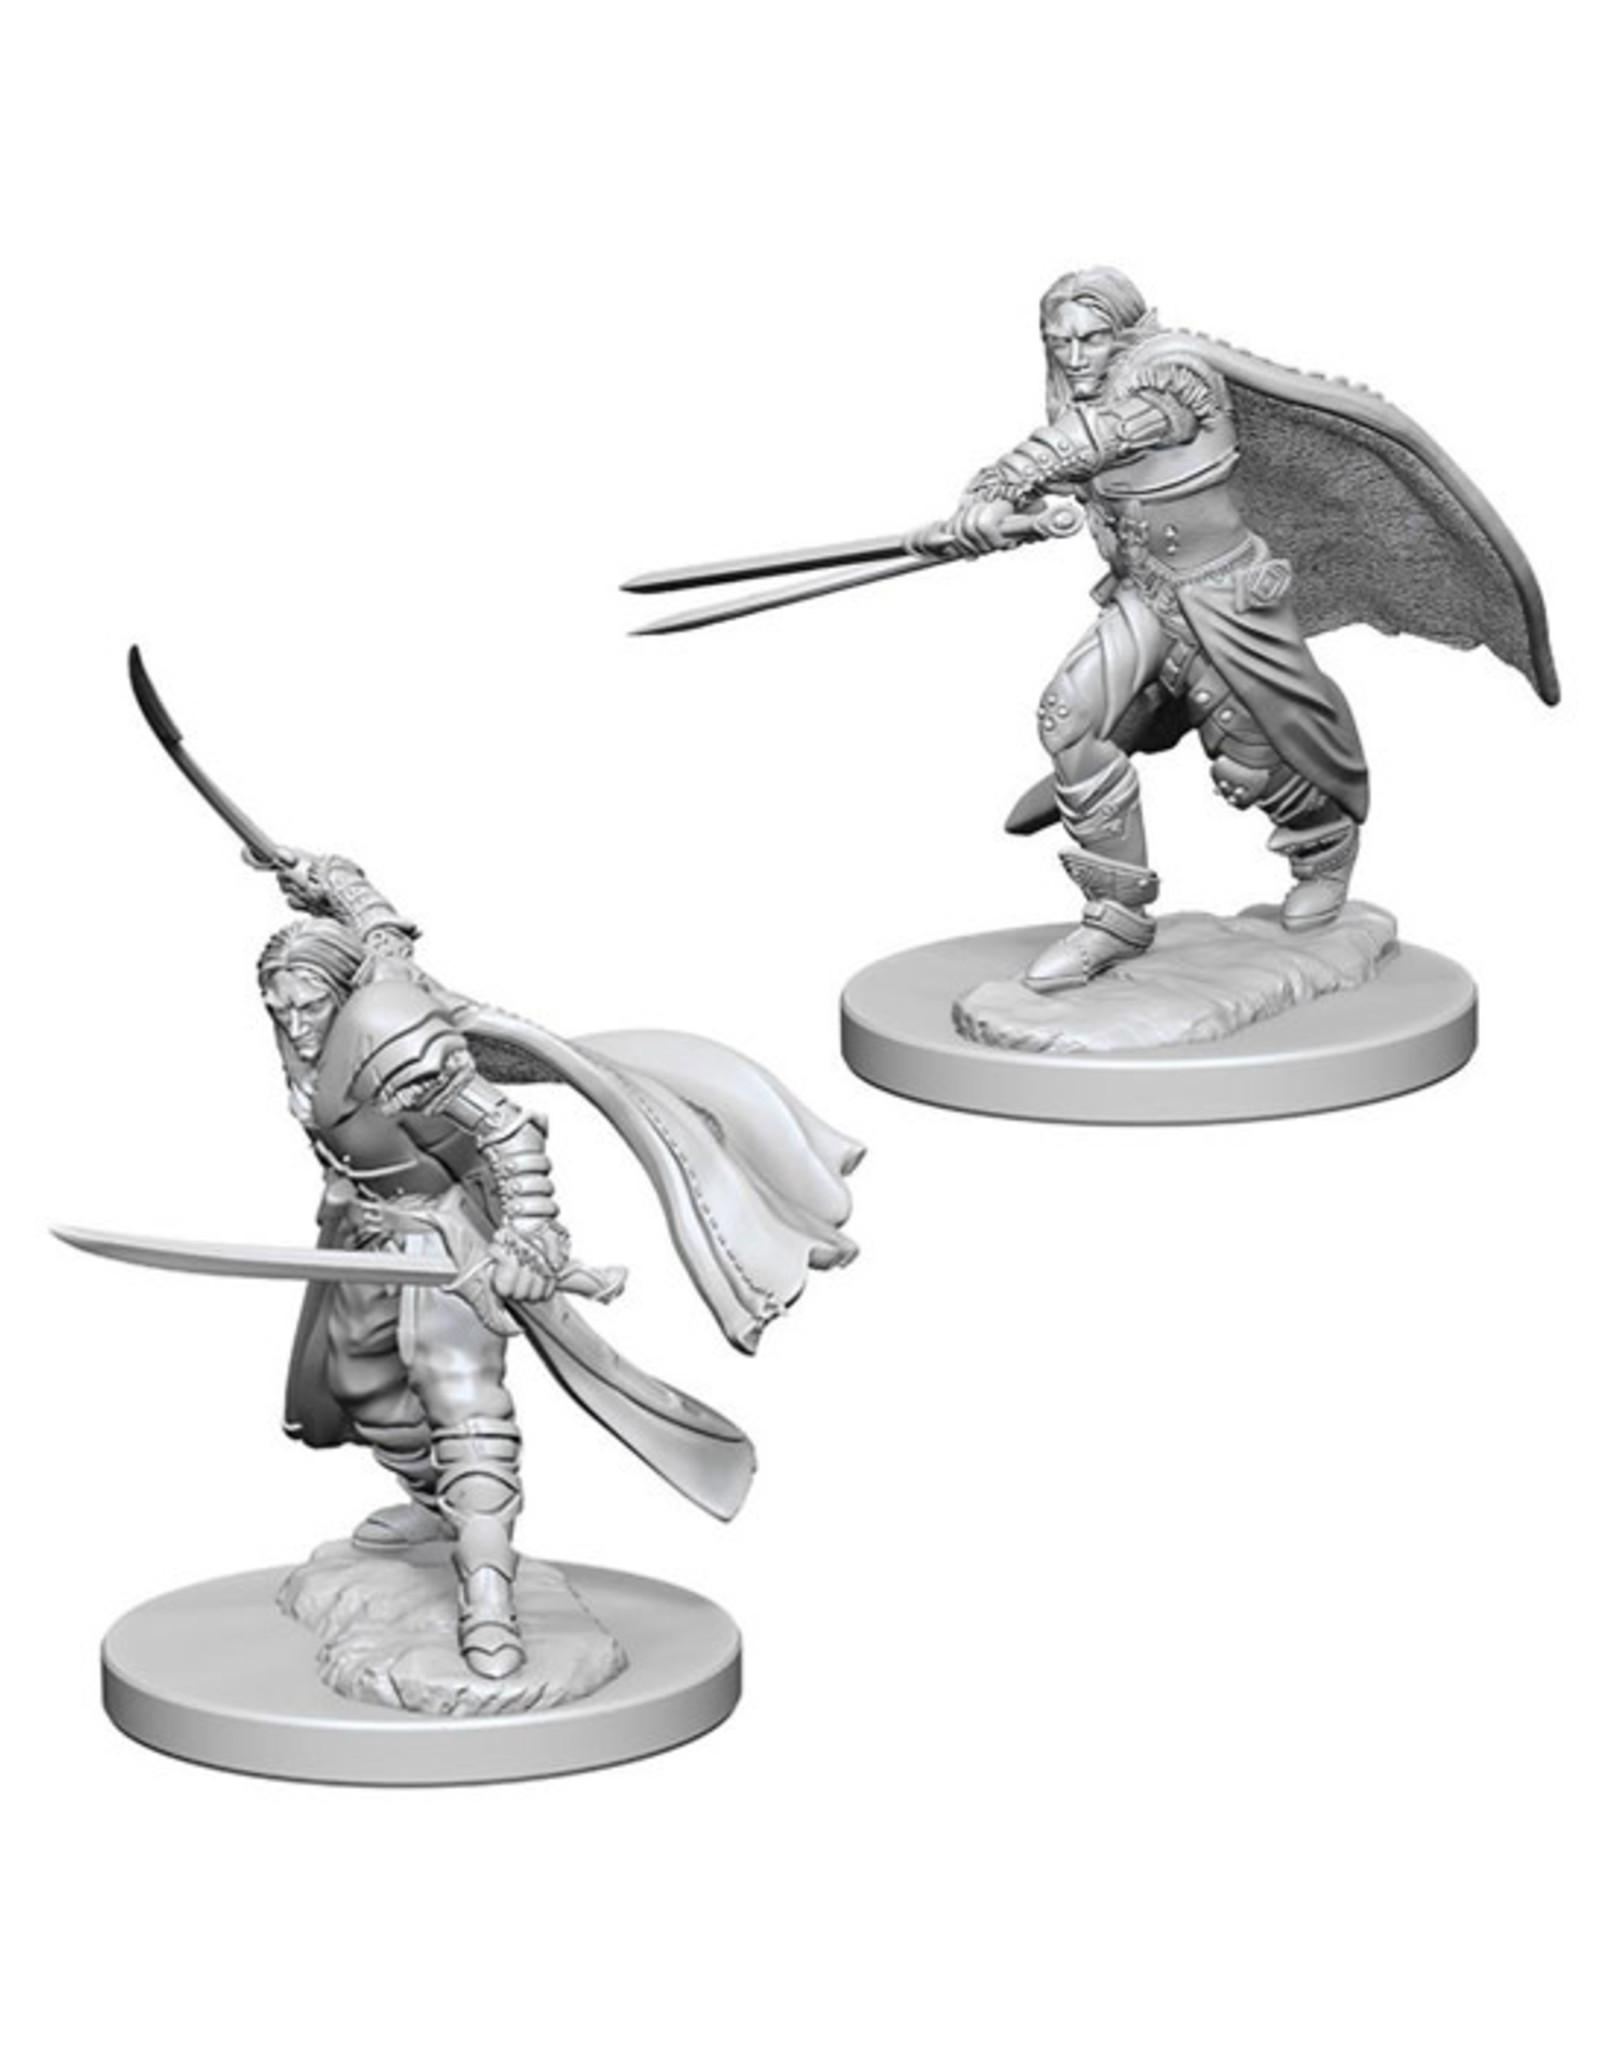 Dungeons & Dragons Dungeons & Dragons: Nolzur's - Elf Male Ranger